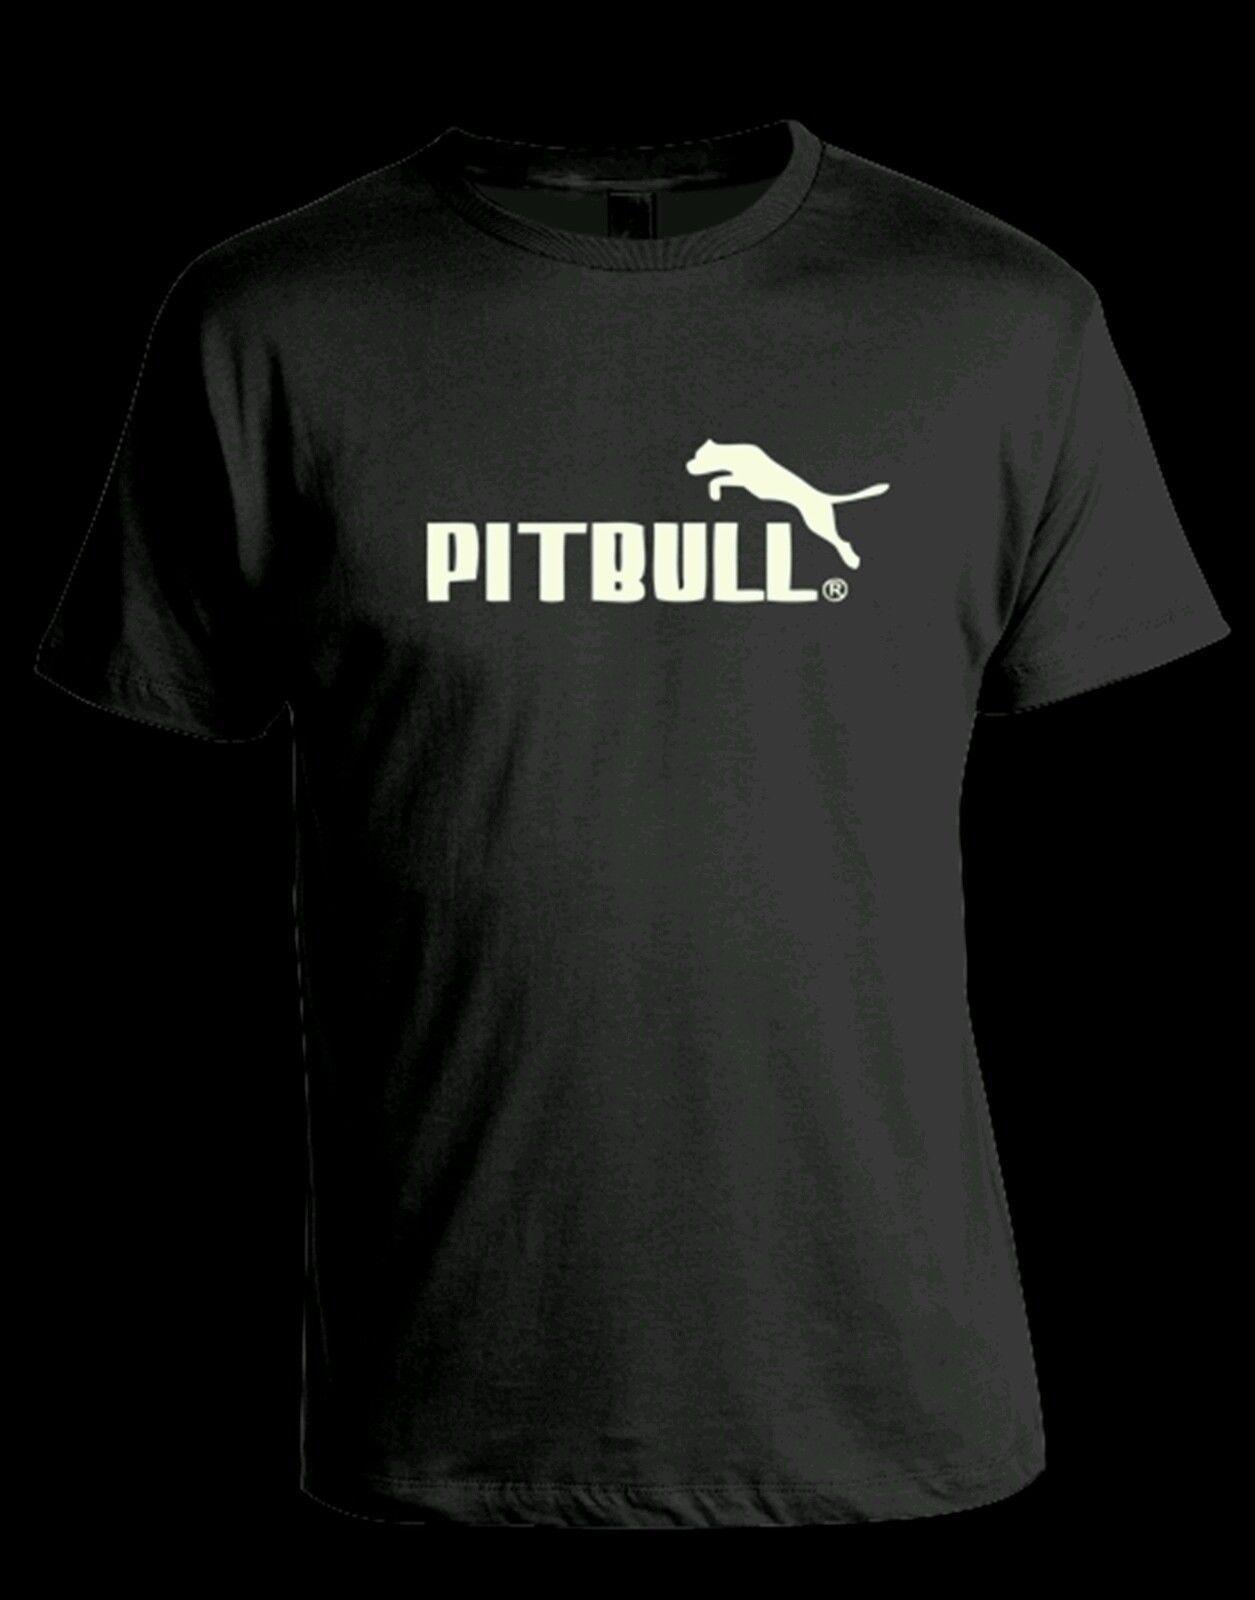 Возьмите футболка Pitbull hund боксе персонал bull S, гм умереть xxl